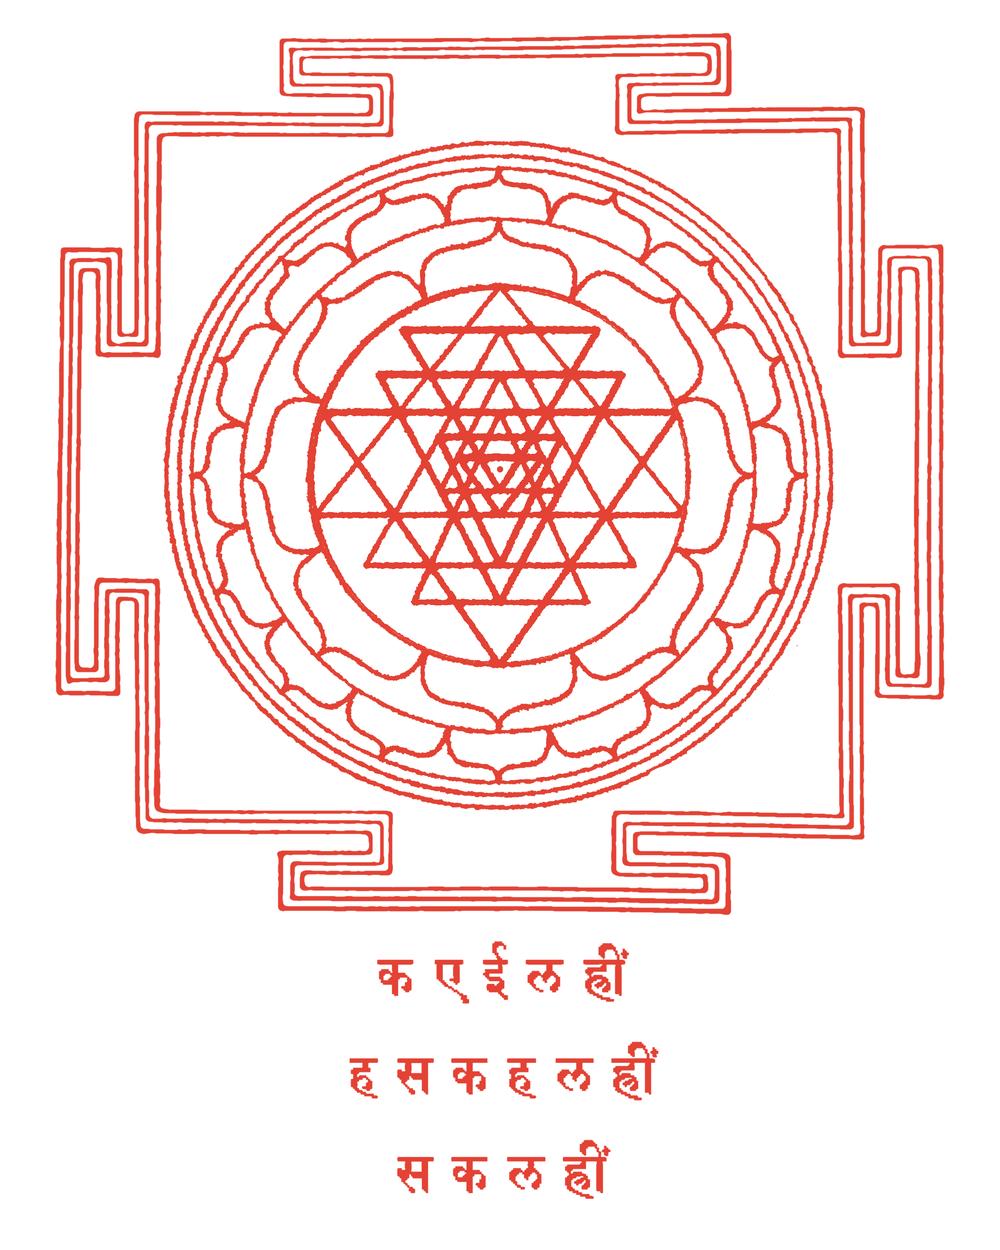 Sri Yantra: Union of Shiva and Shakti, Divine Transcendence and Divine Manifestation